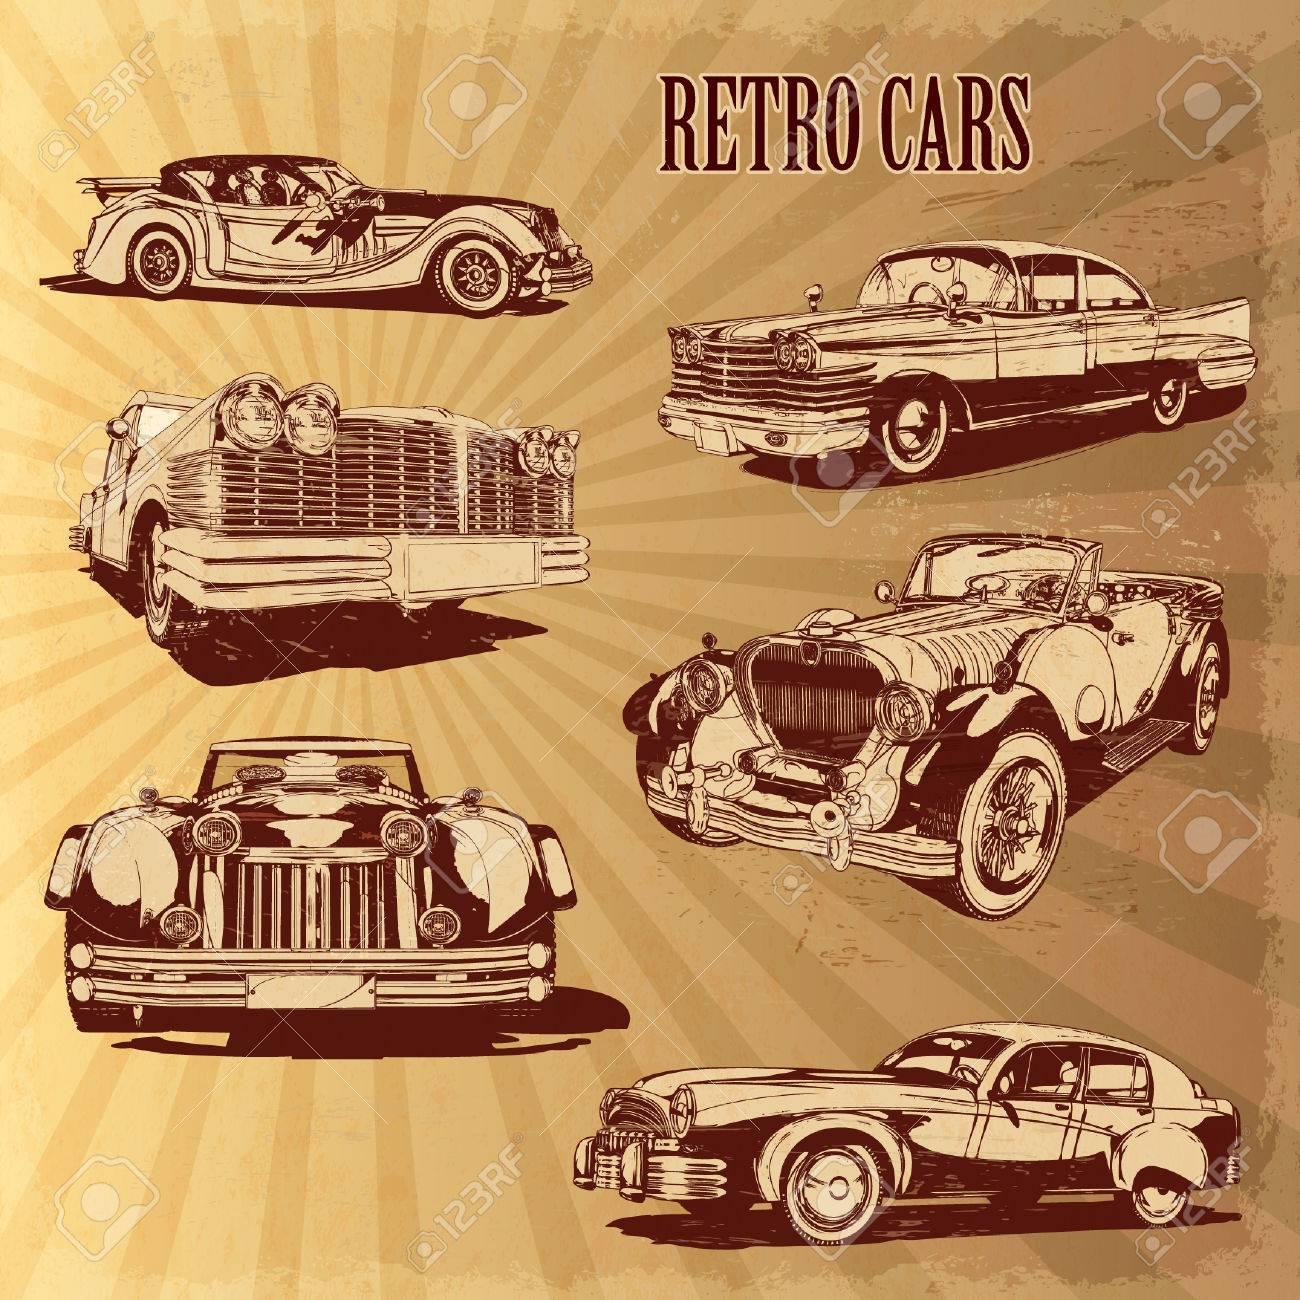 Silhouettes retro cars. - 50143096